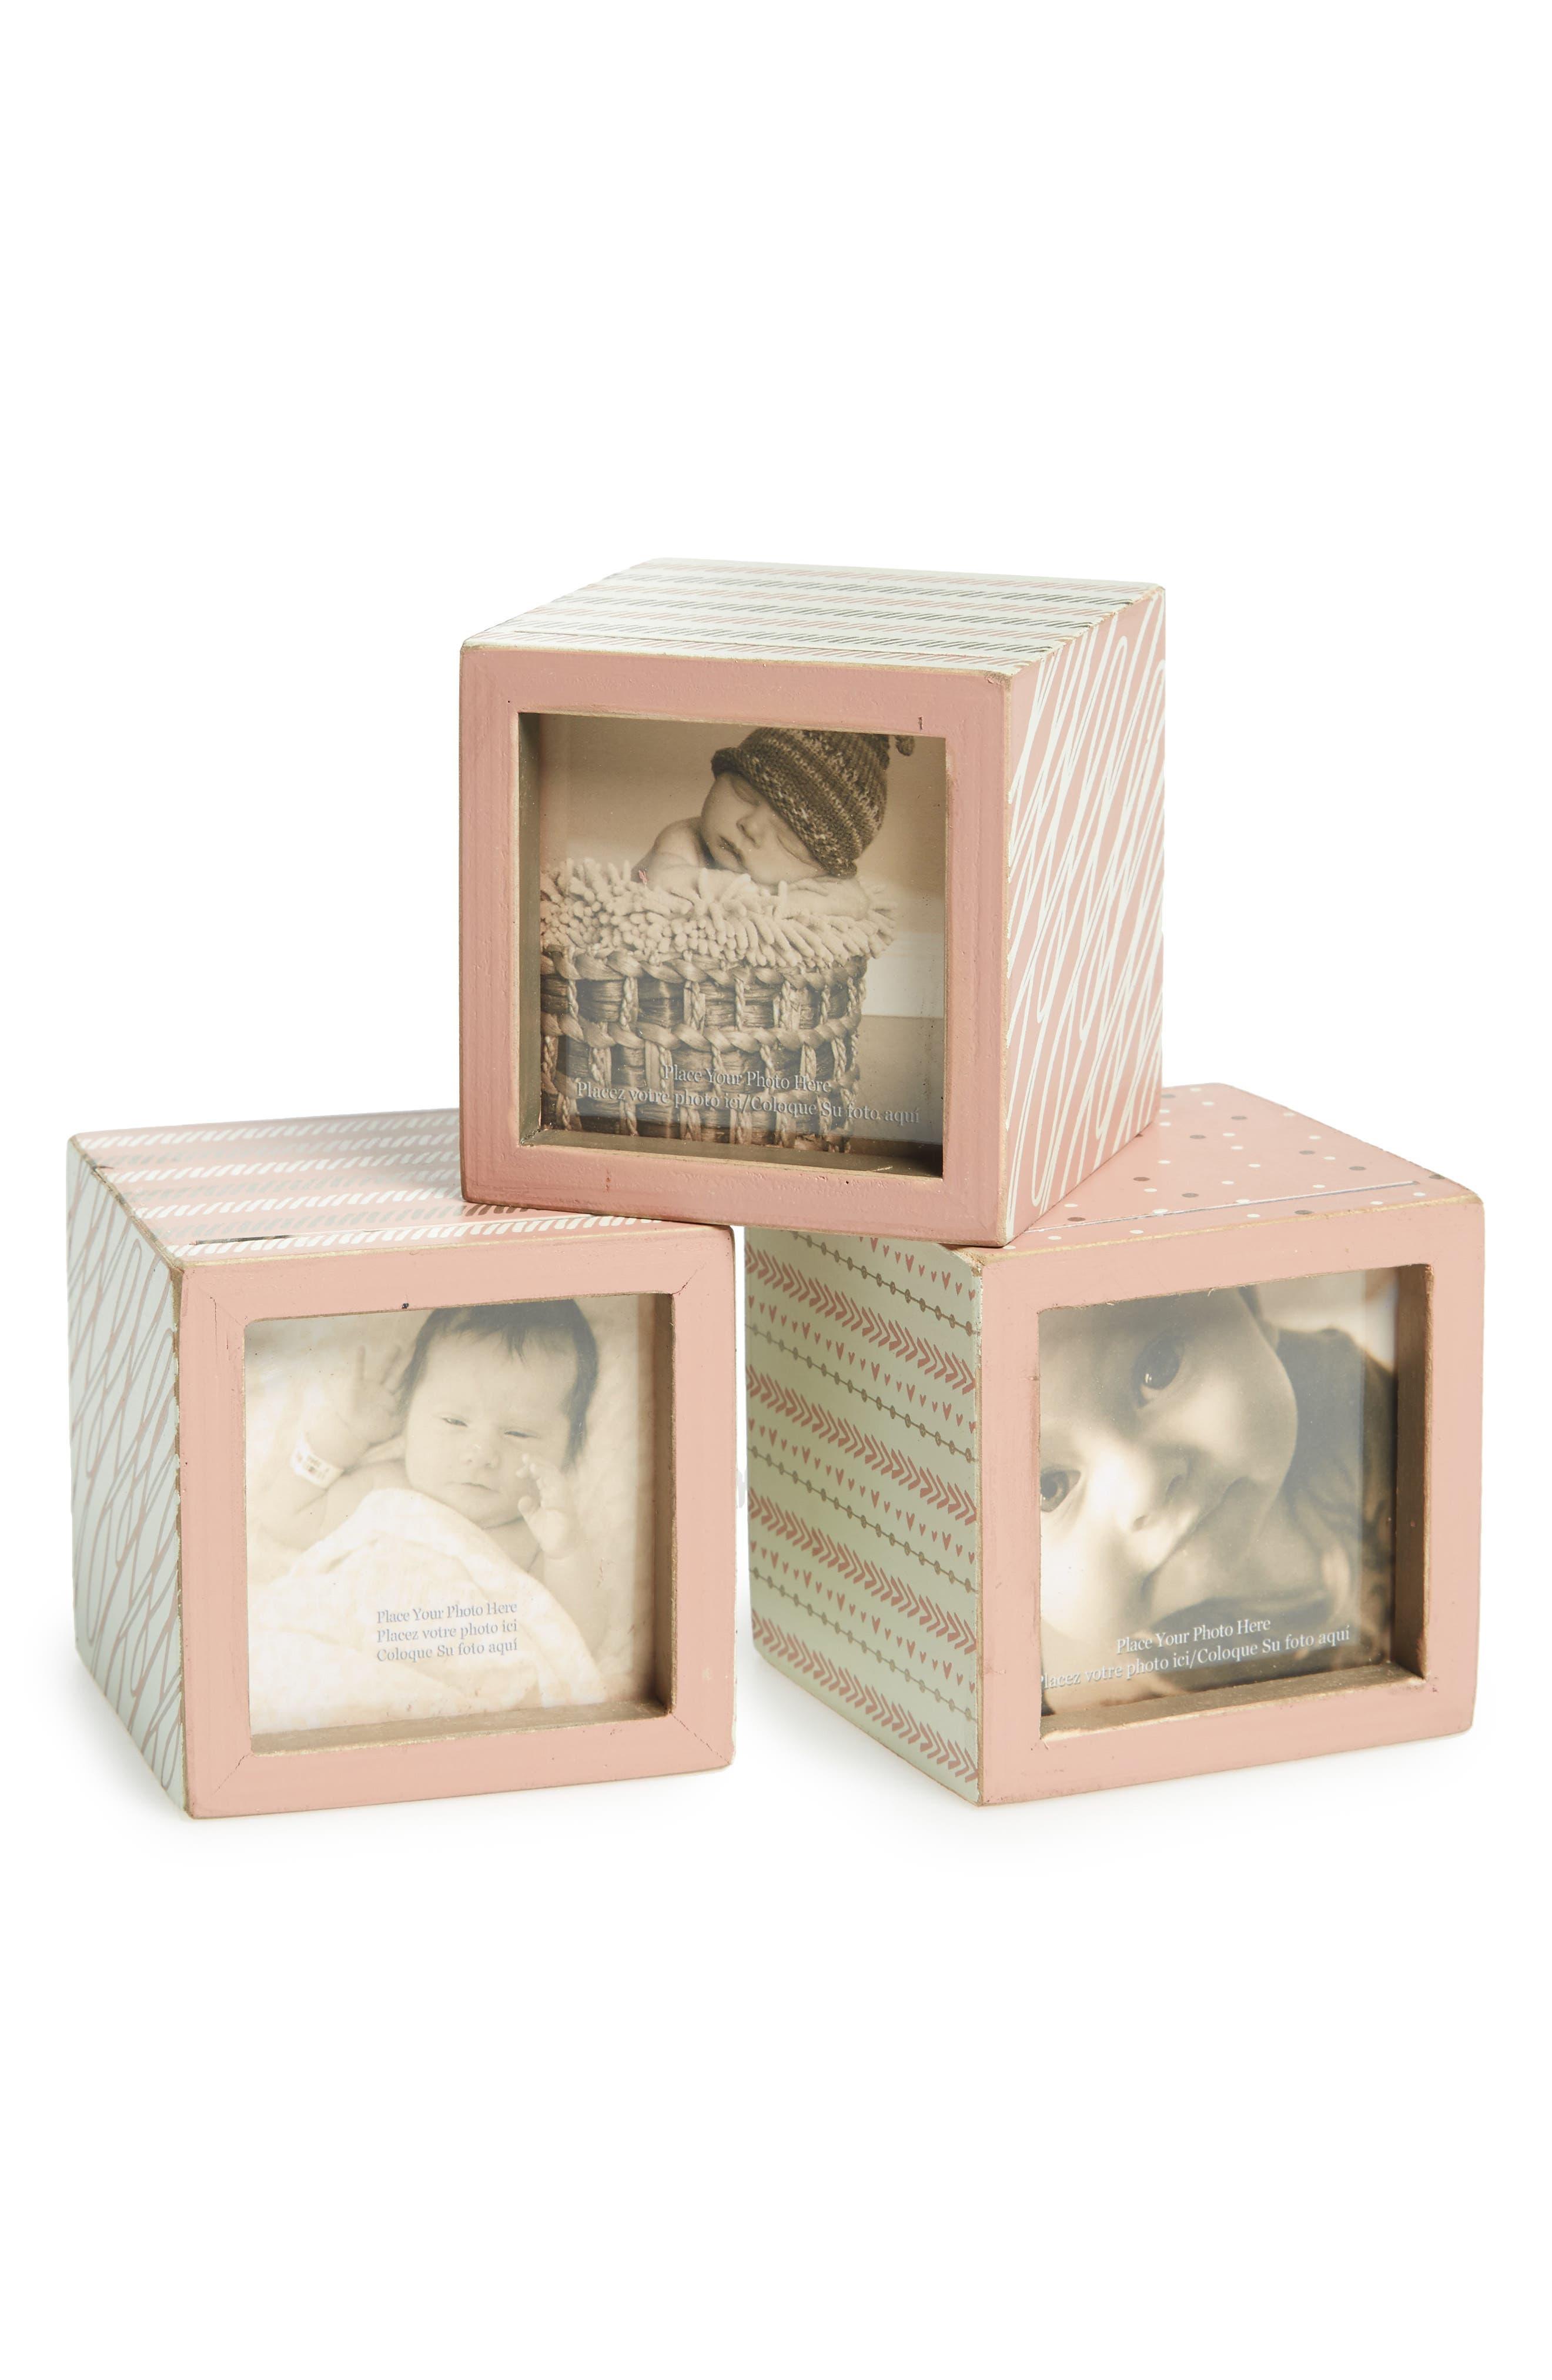 Main Image - Primitives by Kathy Set of 3 Photo Blocks